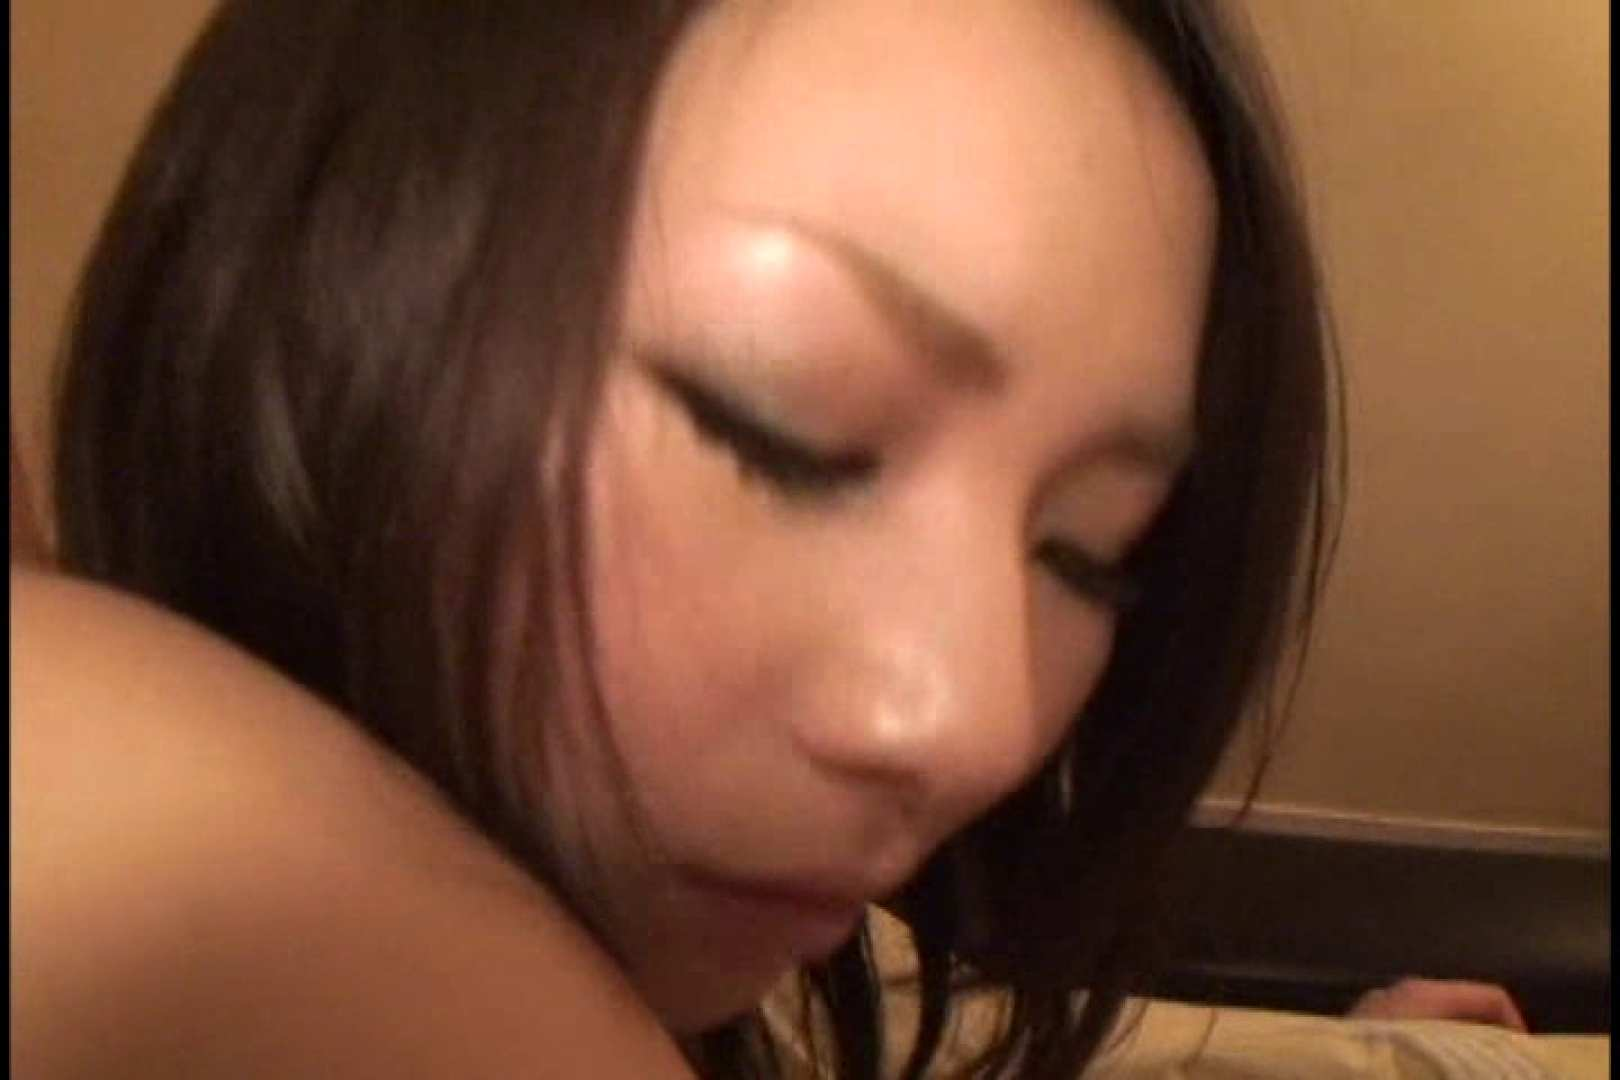 JDハンター全国ツアー vol.045 前編 OLのエロ生活   女子大生のエロ生活  95連発 19